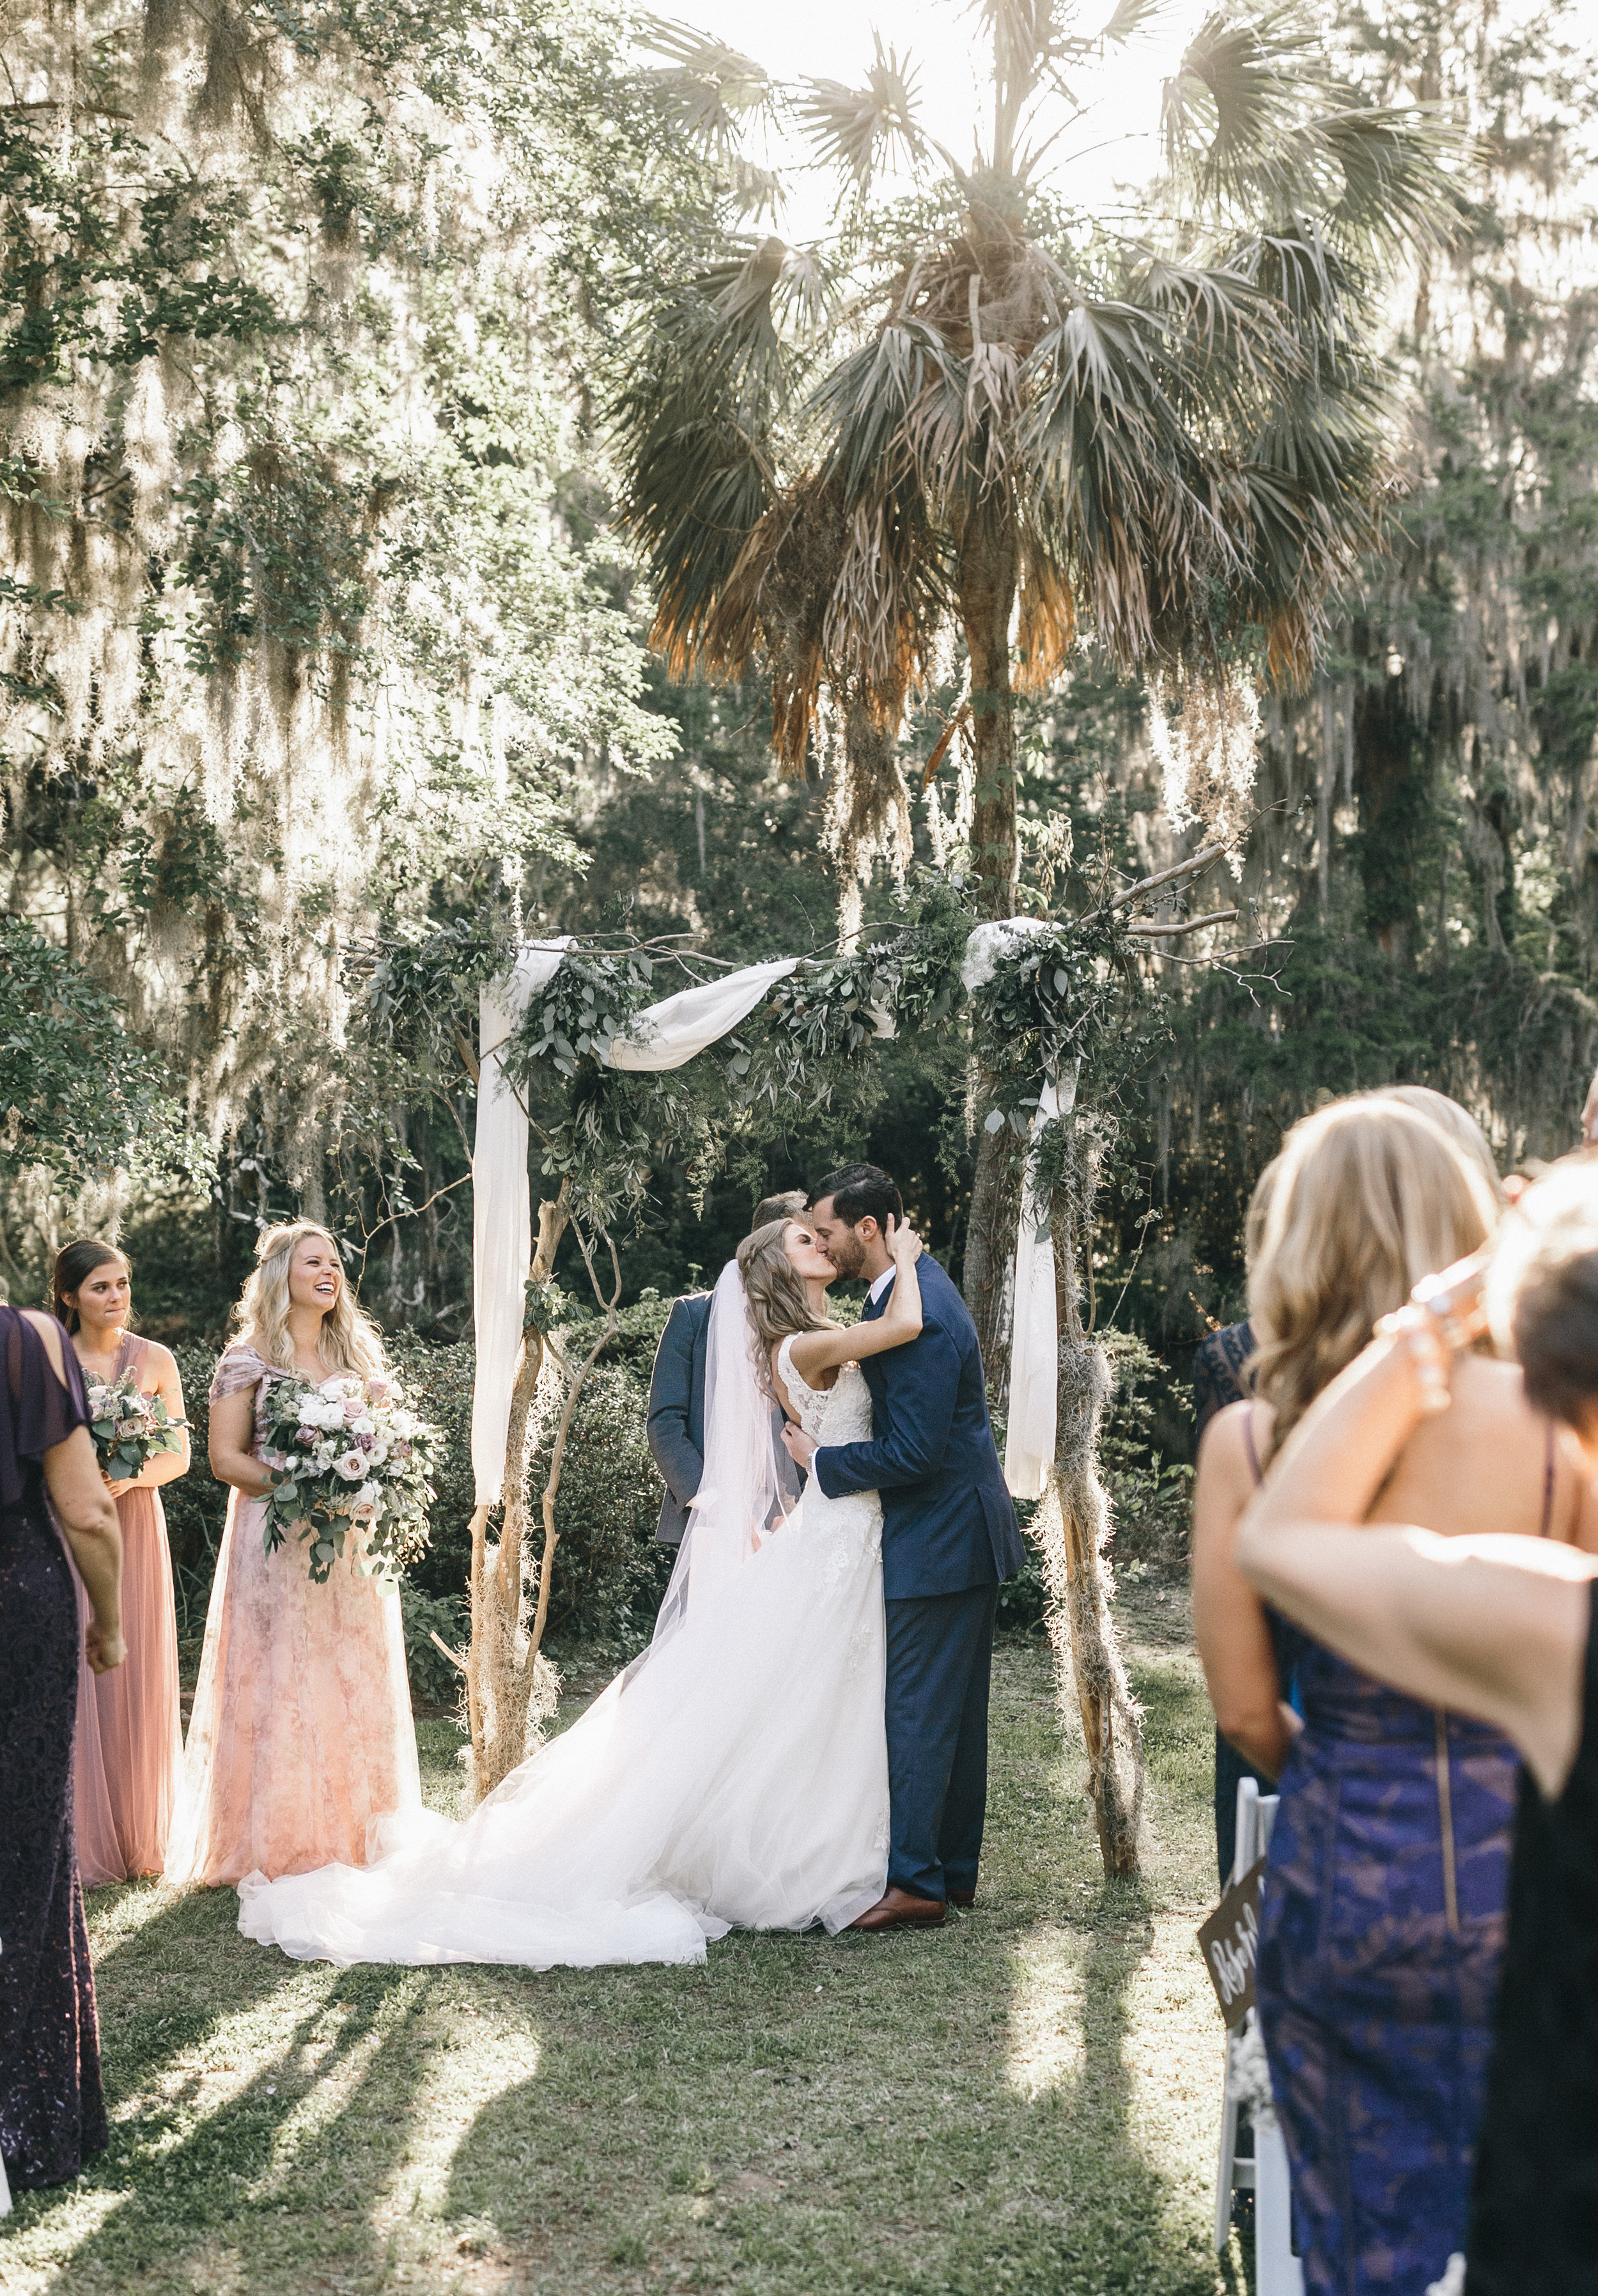 Jenna+Michael_wedding-474.jpg